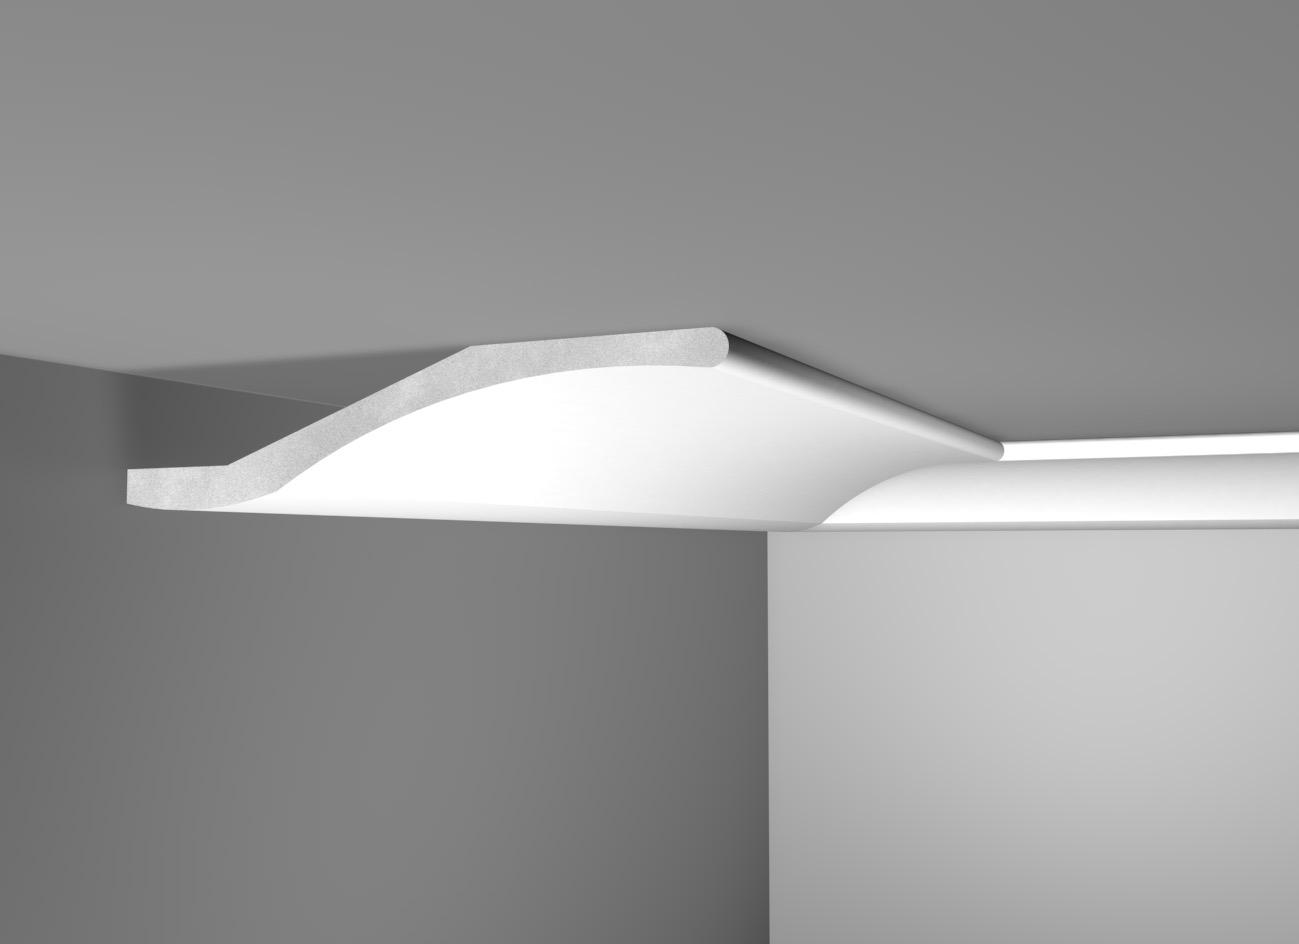 Lux 40 - Cornice in polistirene gessato bianco - Decorget - Ital Decori - Image 0